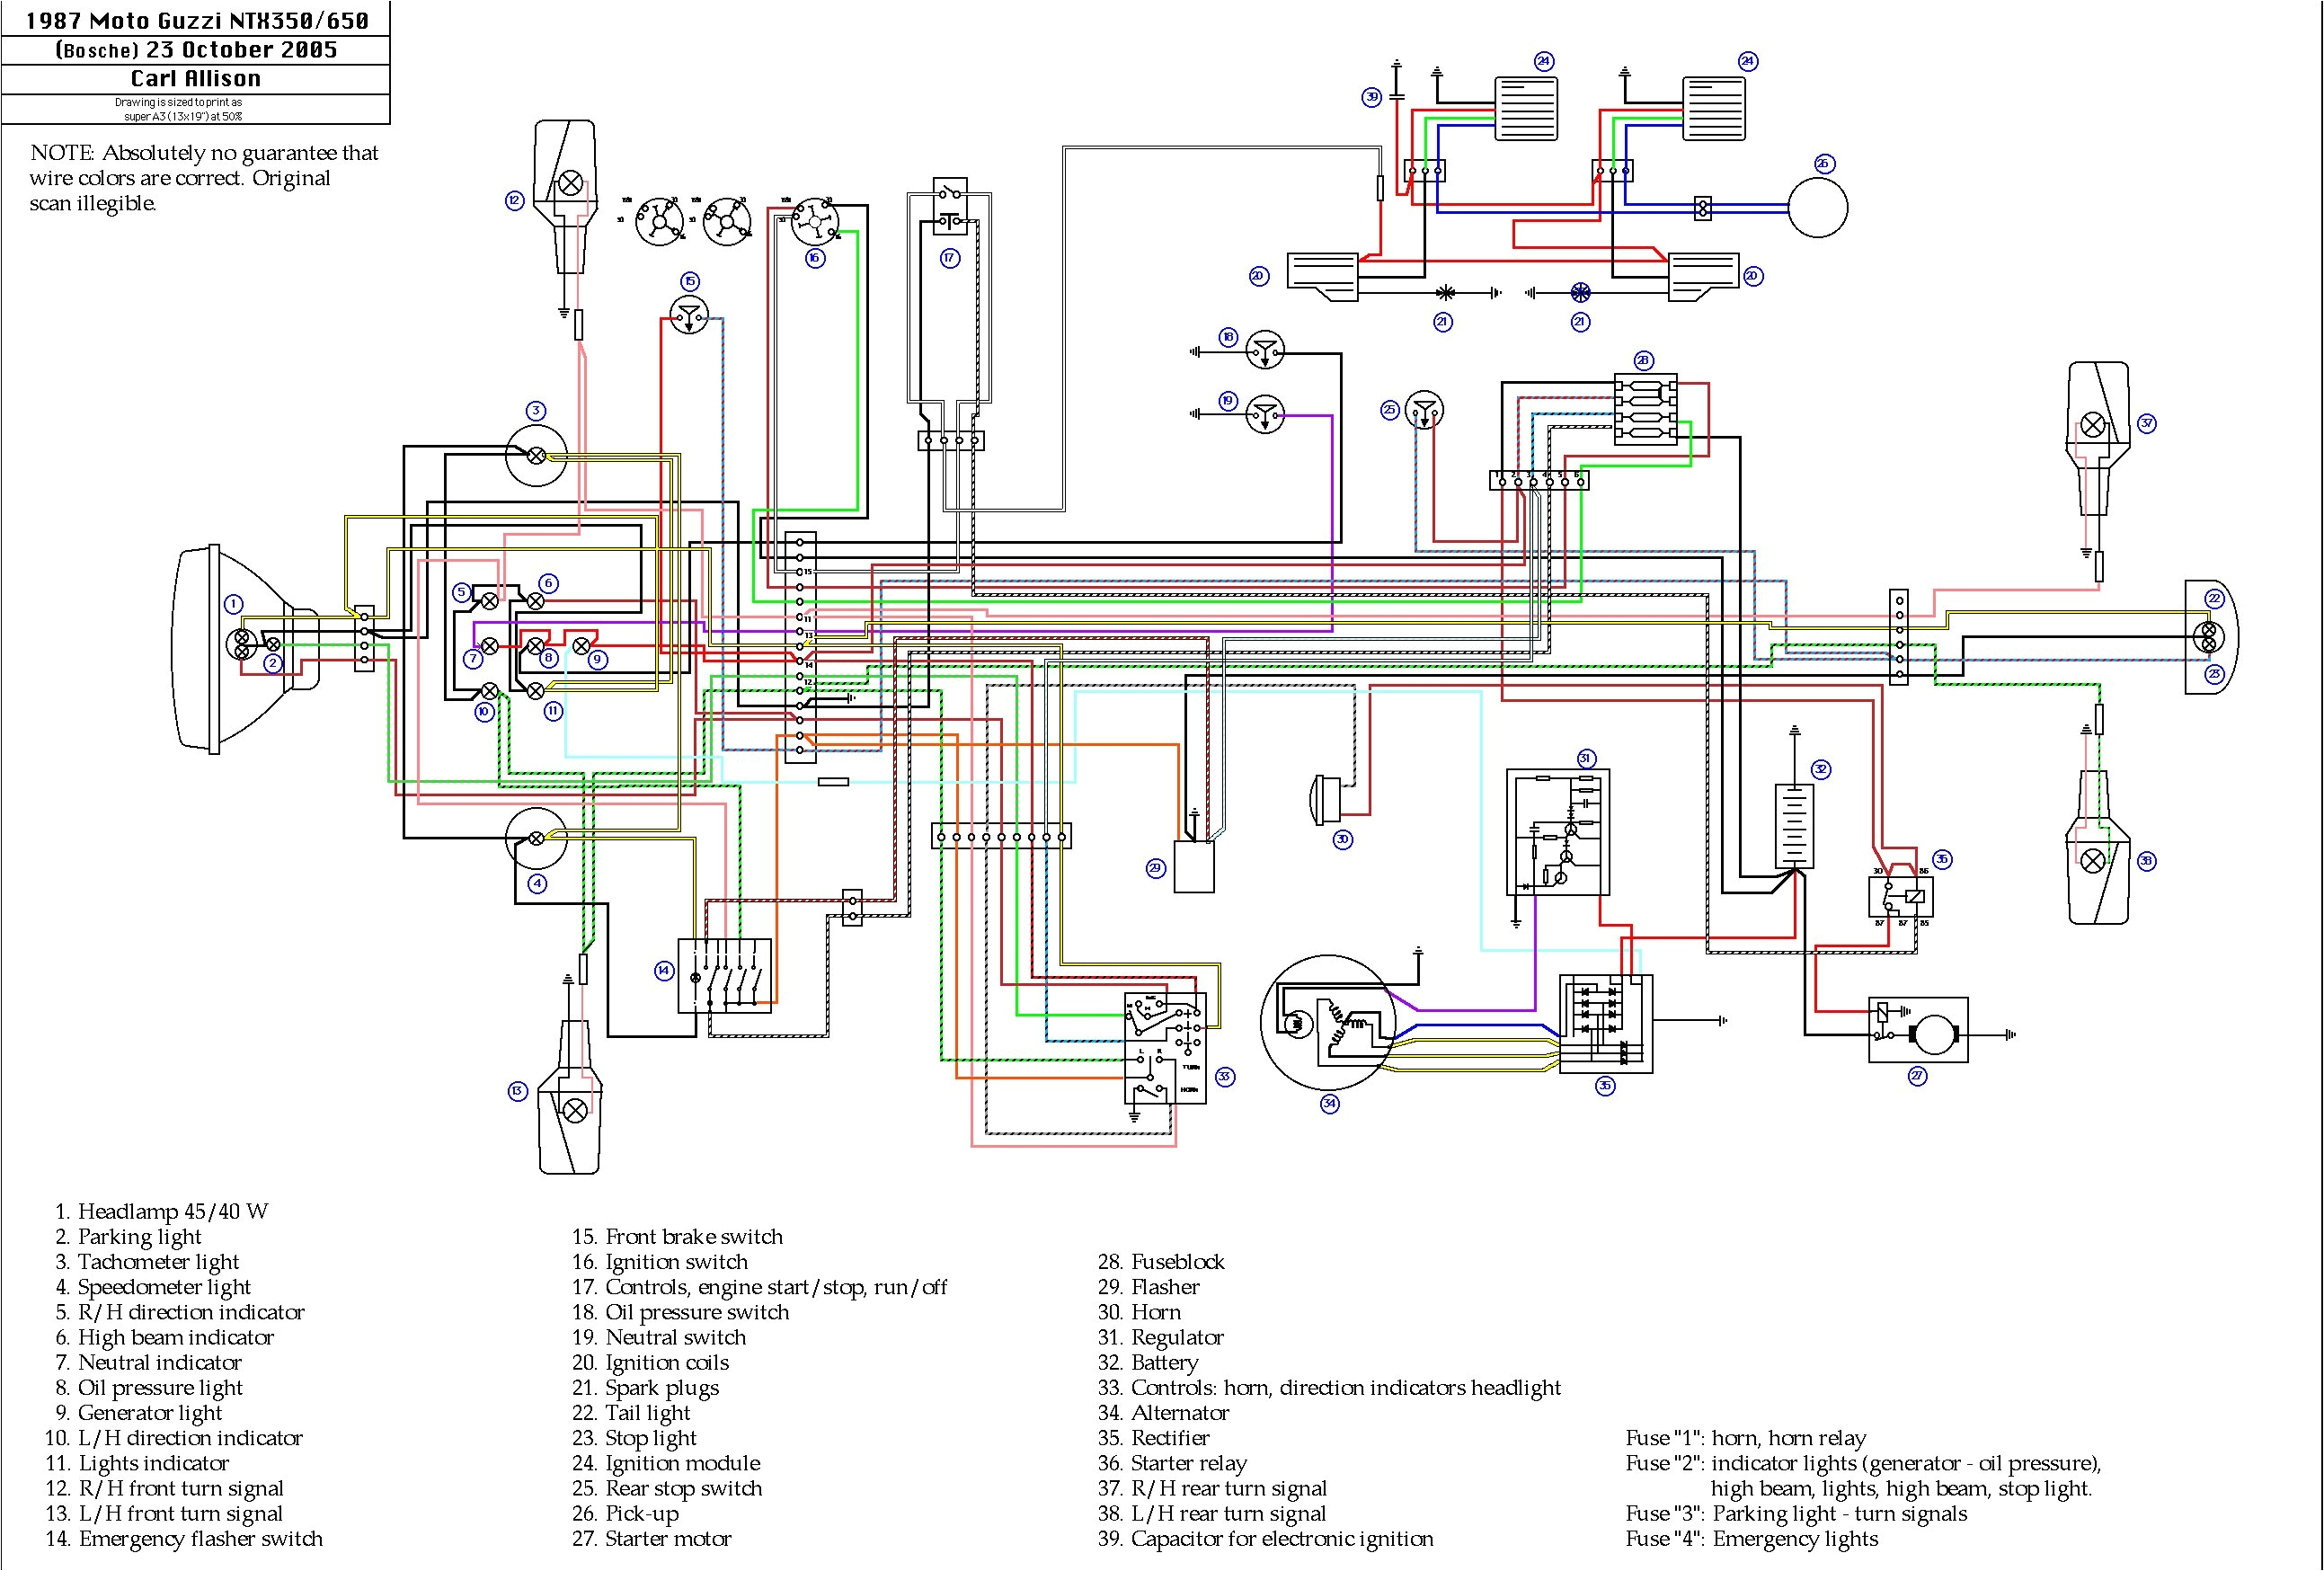 Aprilia Rs 50 Wiring Diagram Aprilia Wiring Diagram Wiring Diagrams Konsult